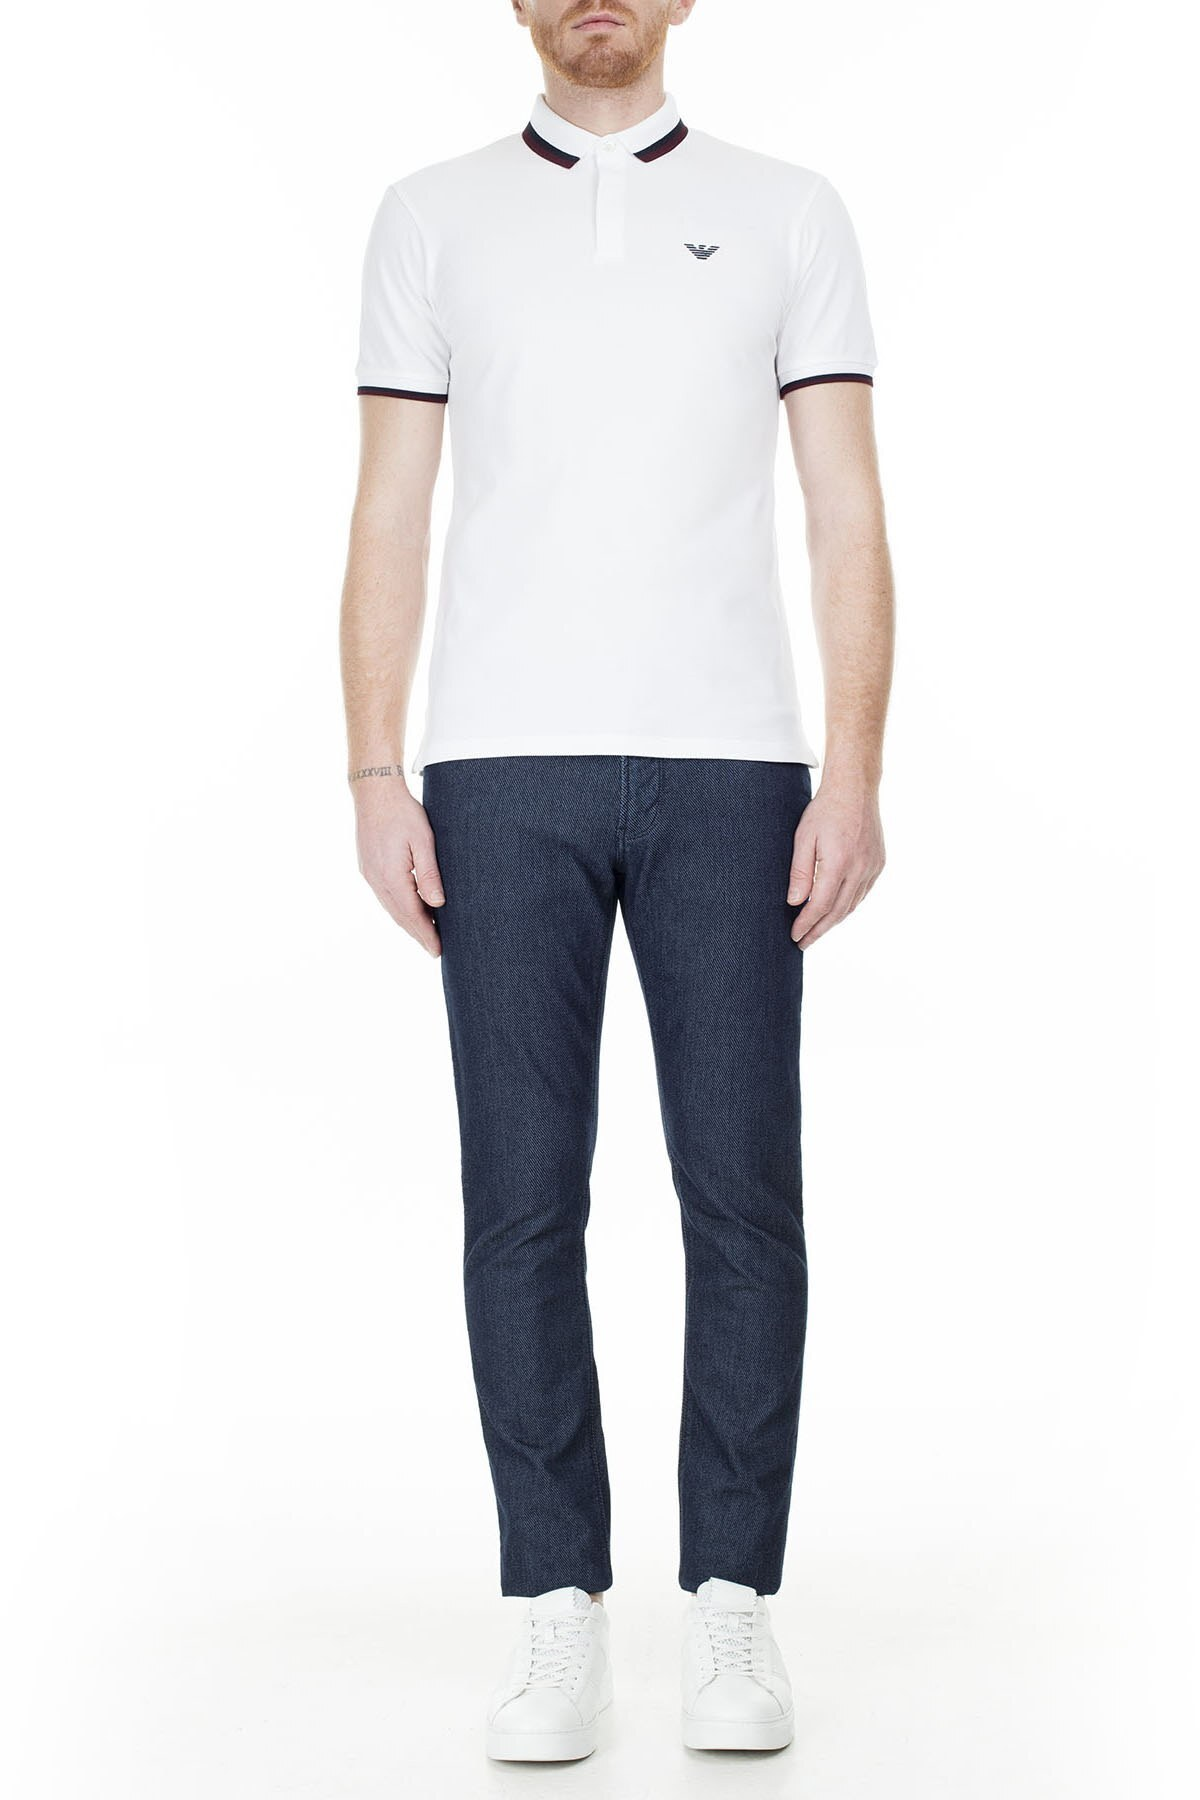 Emporio Armani J06 Jeans Erkek Kot Pantolon S 6G1J06 1D6HZ 0941 LACİVERT